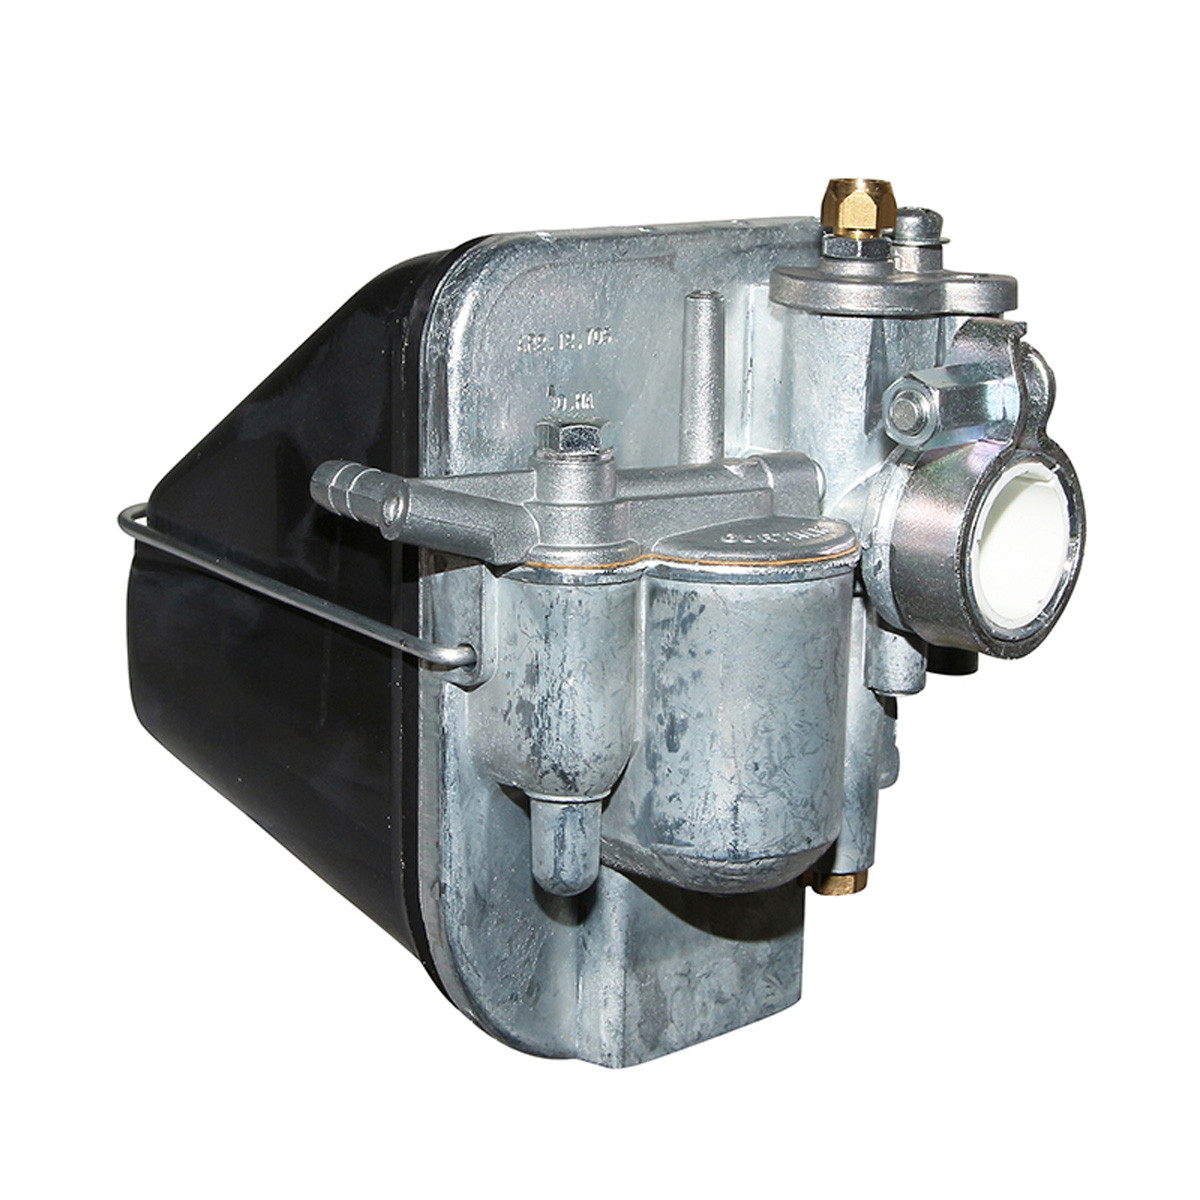 Carburateur Motobécane Motoconfort 40 50 88 - GURTNER AR2-12 705